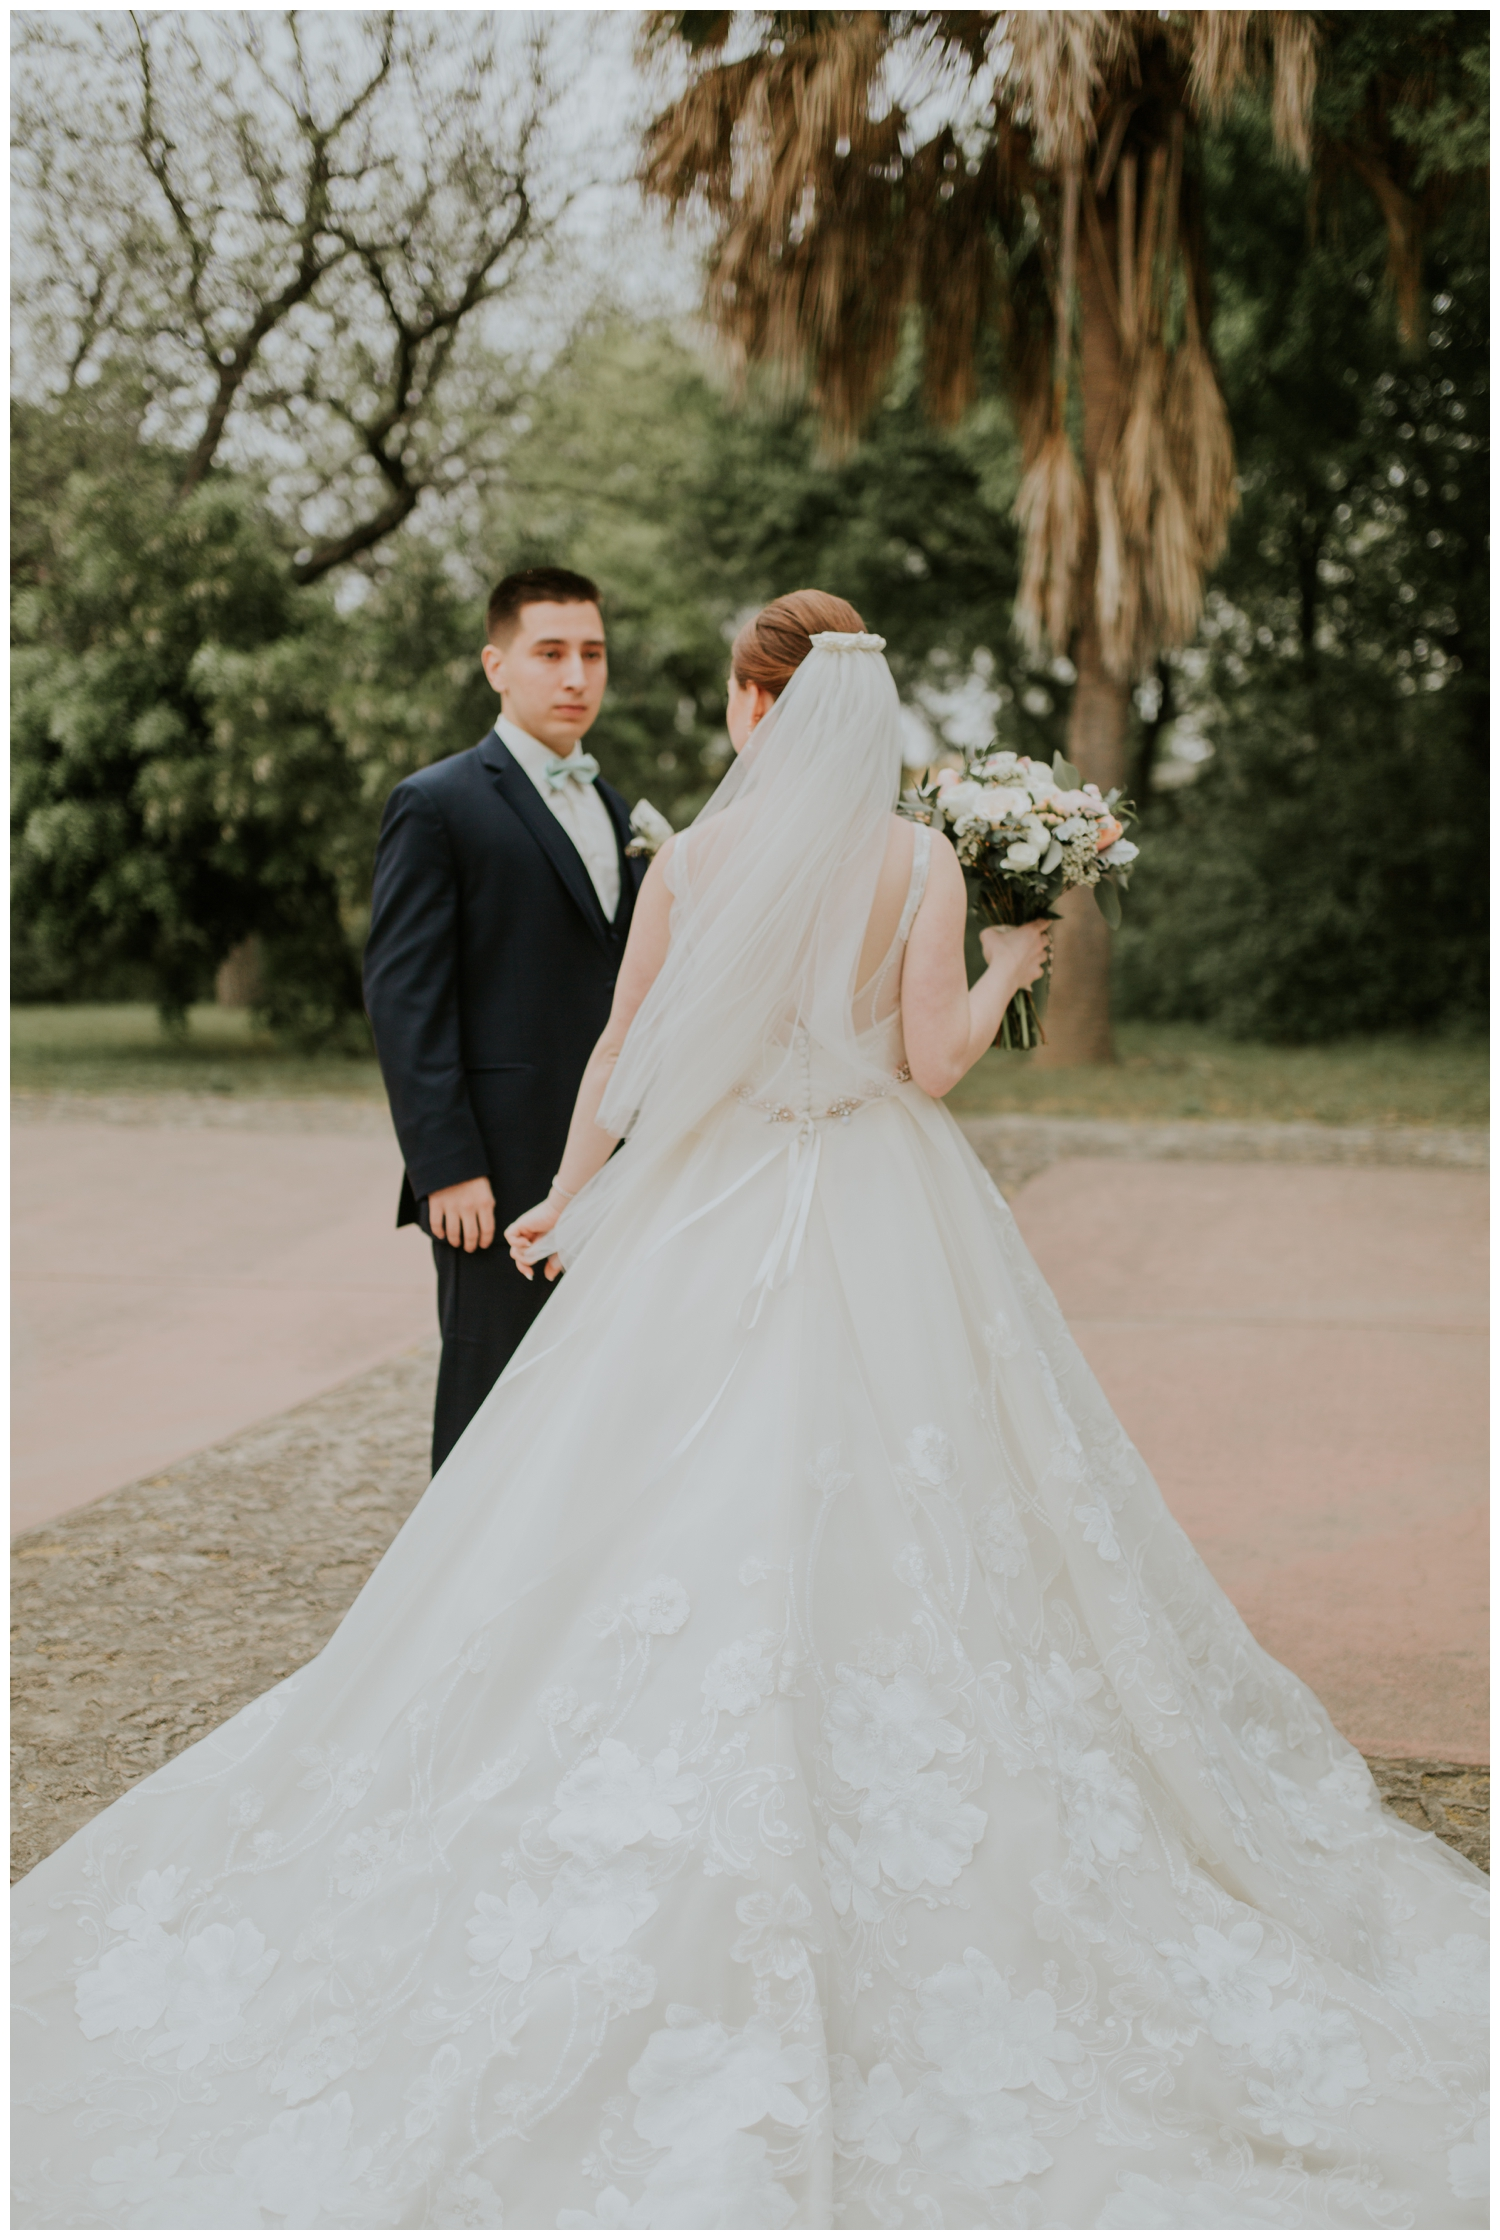 Jenna+Brandon, Mission Concepcion Wedding, San Antonio, Contista Productions Wedding Photography_0086.jpg